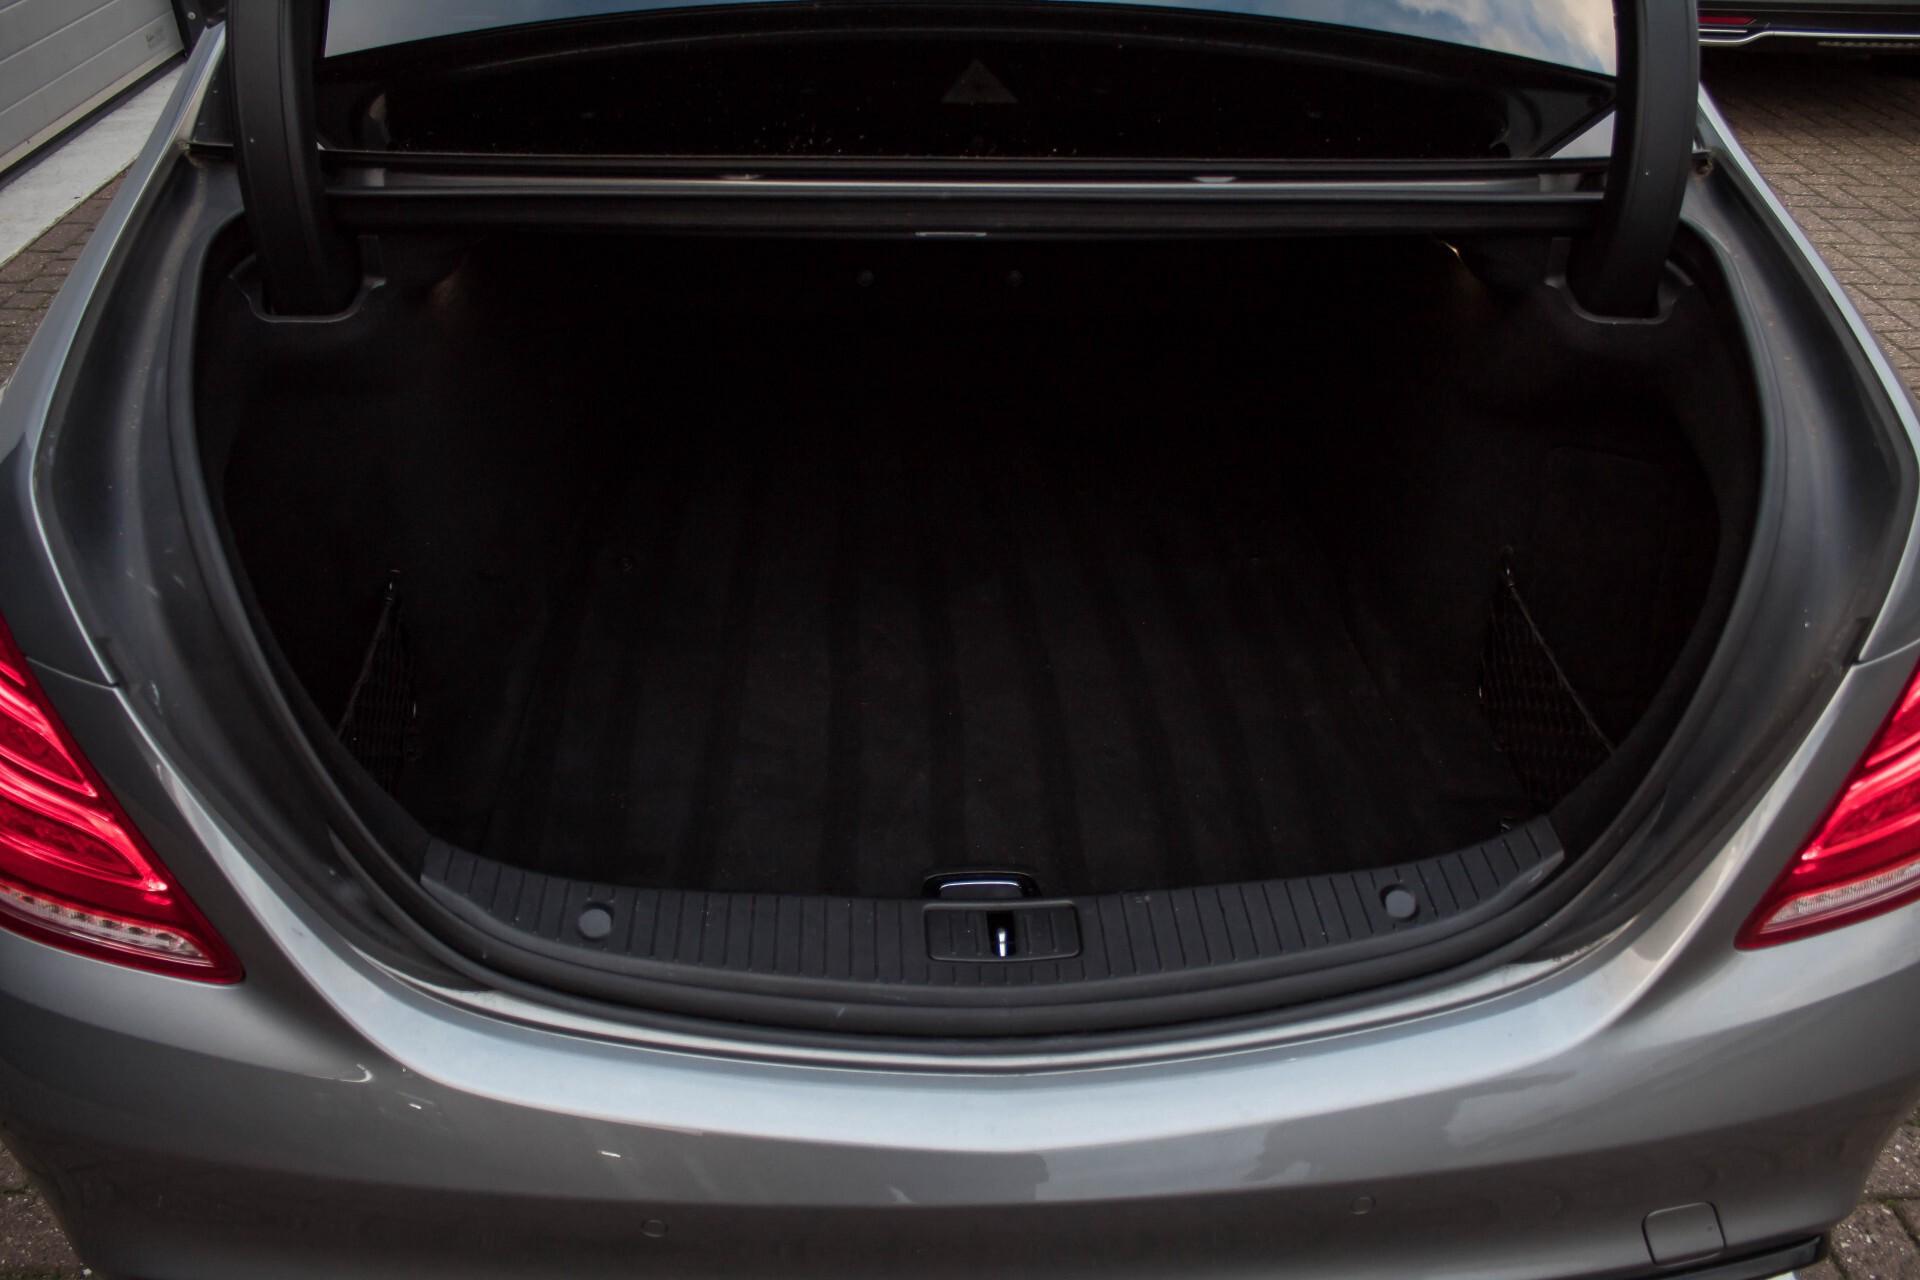 Mercedes-Benz S-Klasse 350 BlueTEC 63 AMG Panorama/Distronic/Keyless/Massage/Burmester Aut7 Foto 38